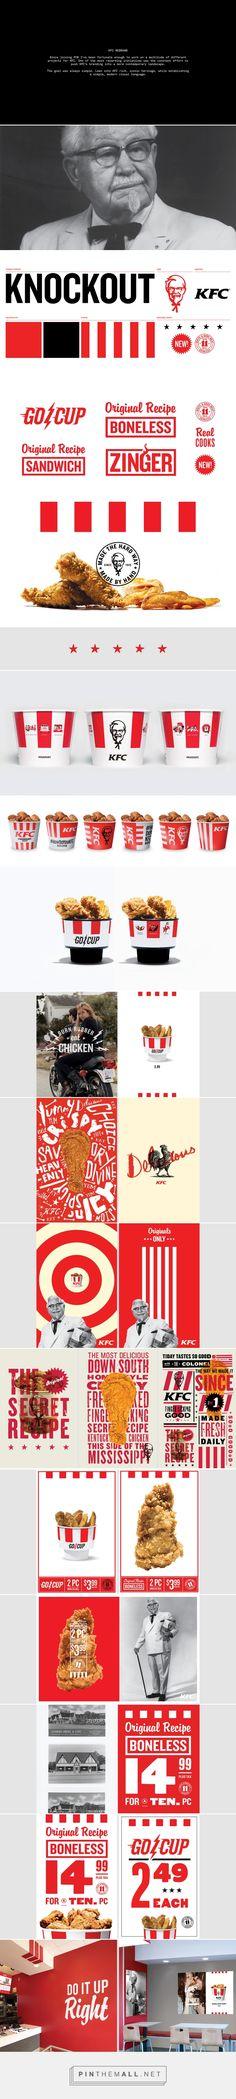 KFC Rebrand on Behance - created via https://pinthemall.net